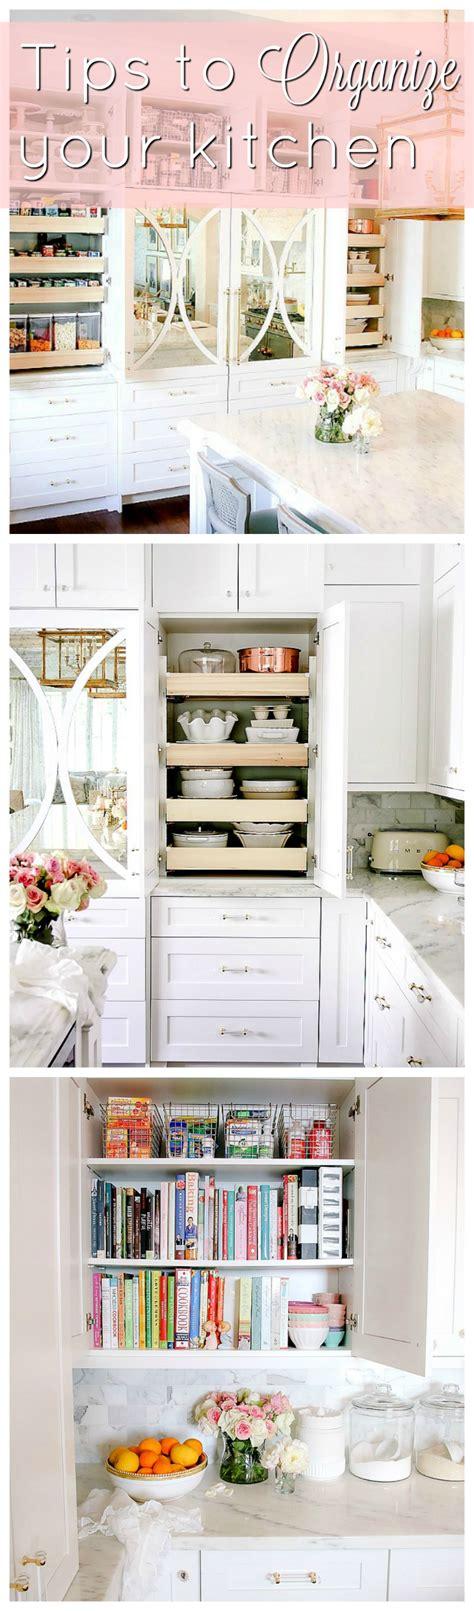 cleaning kitchen cabinet organizing tips randi